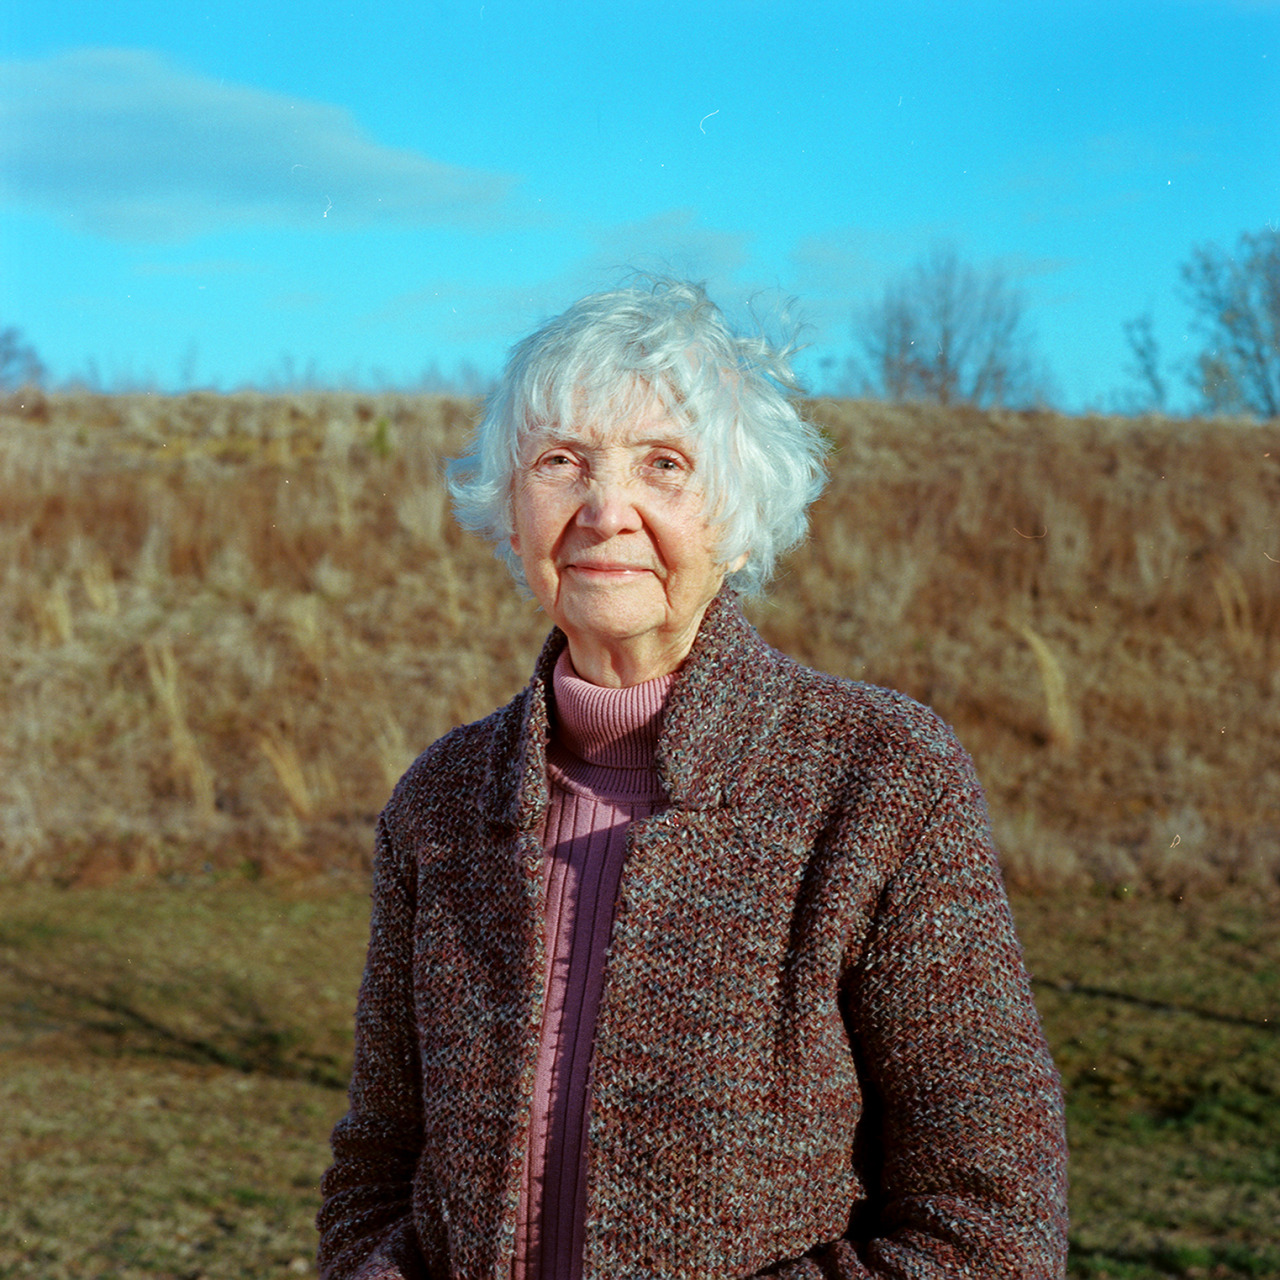 Marty Jane